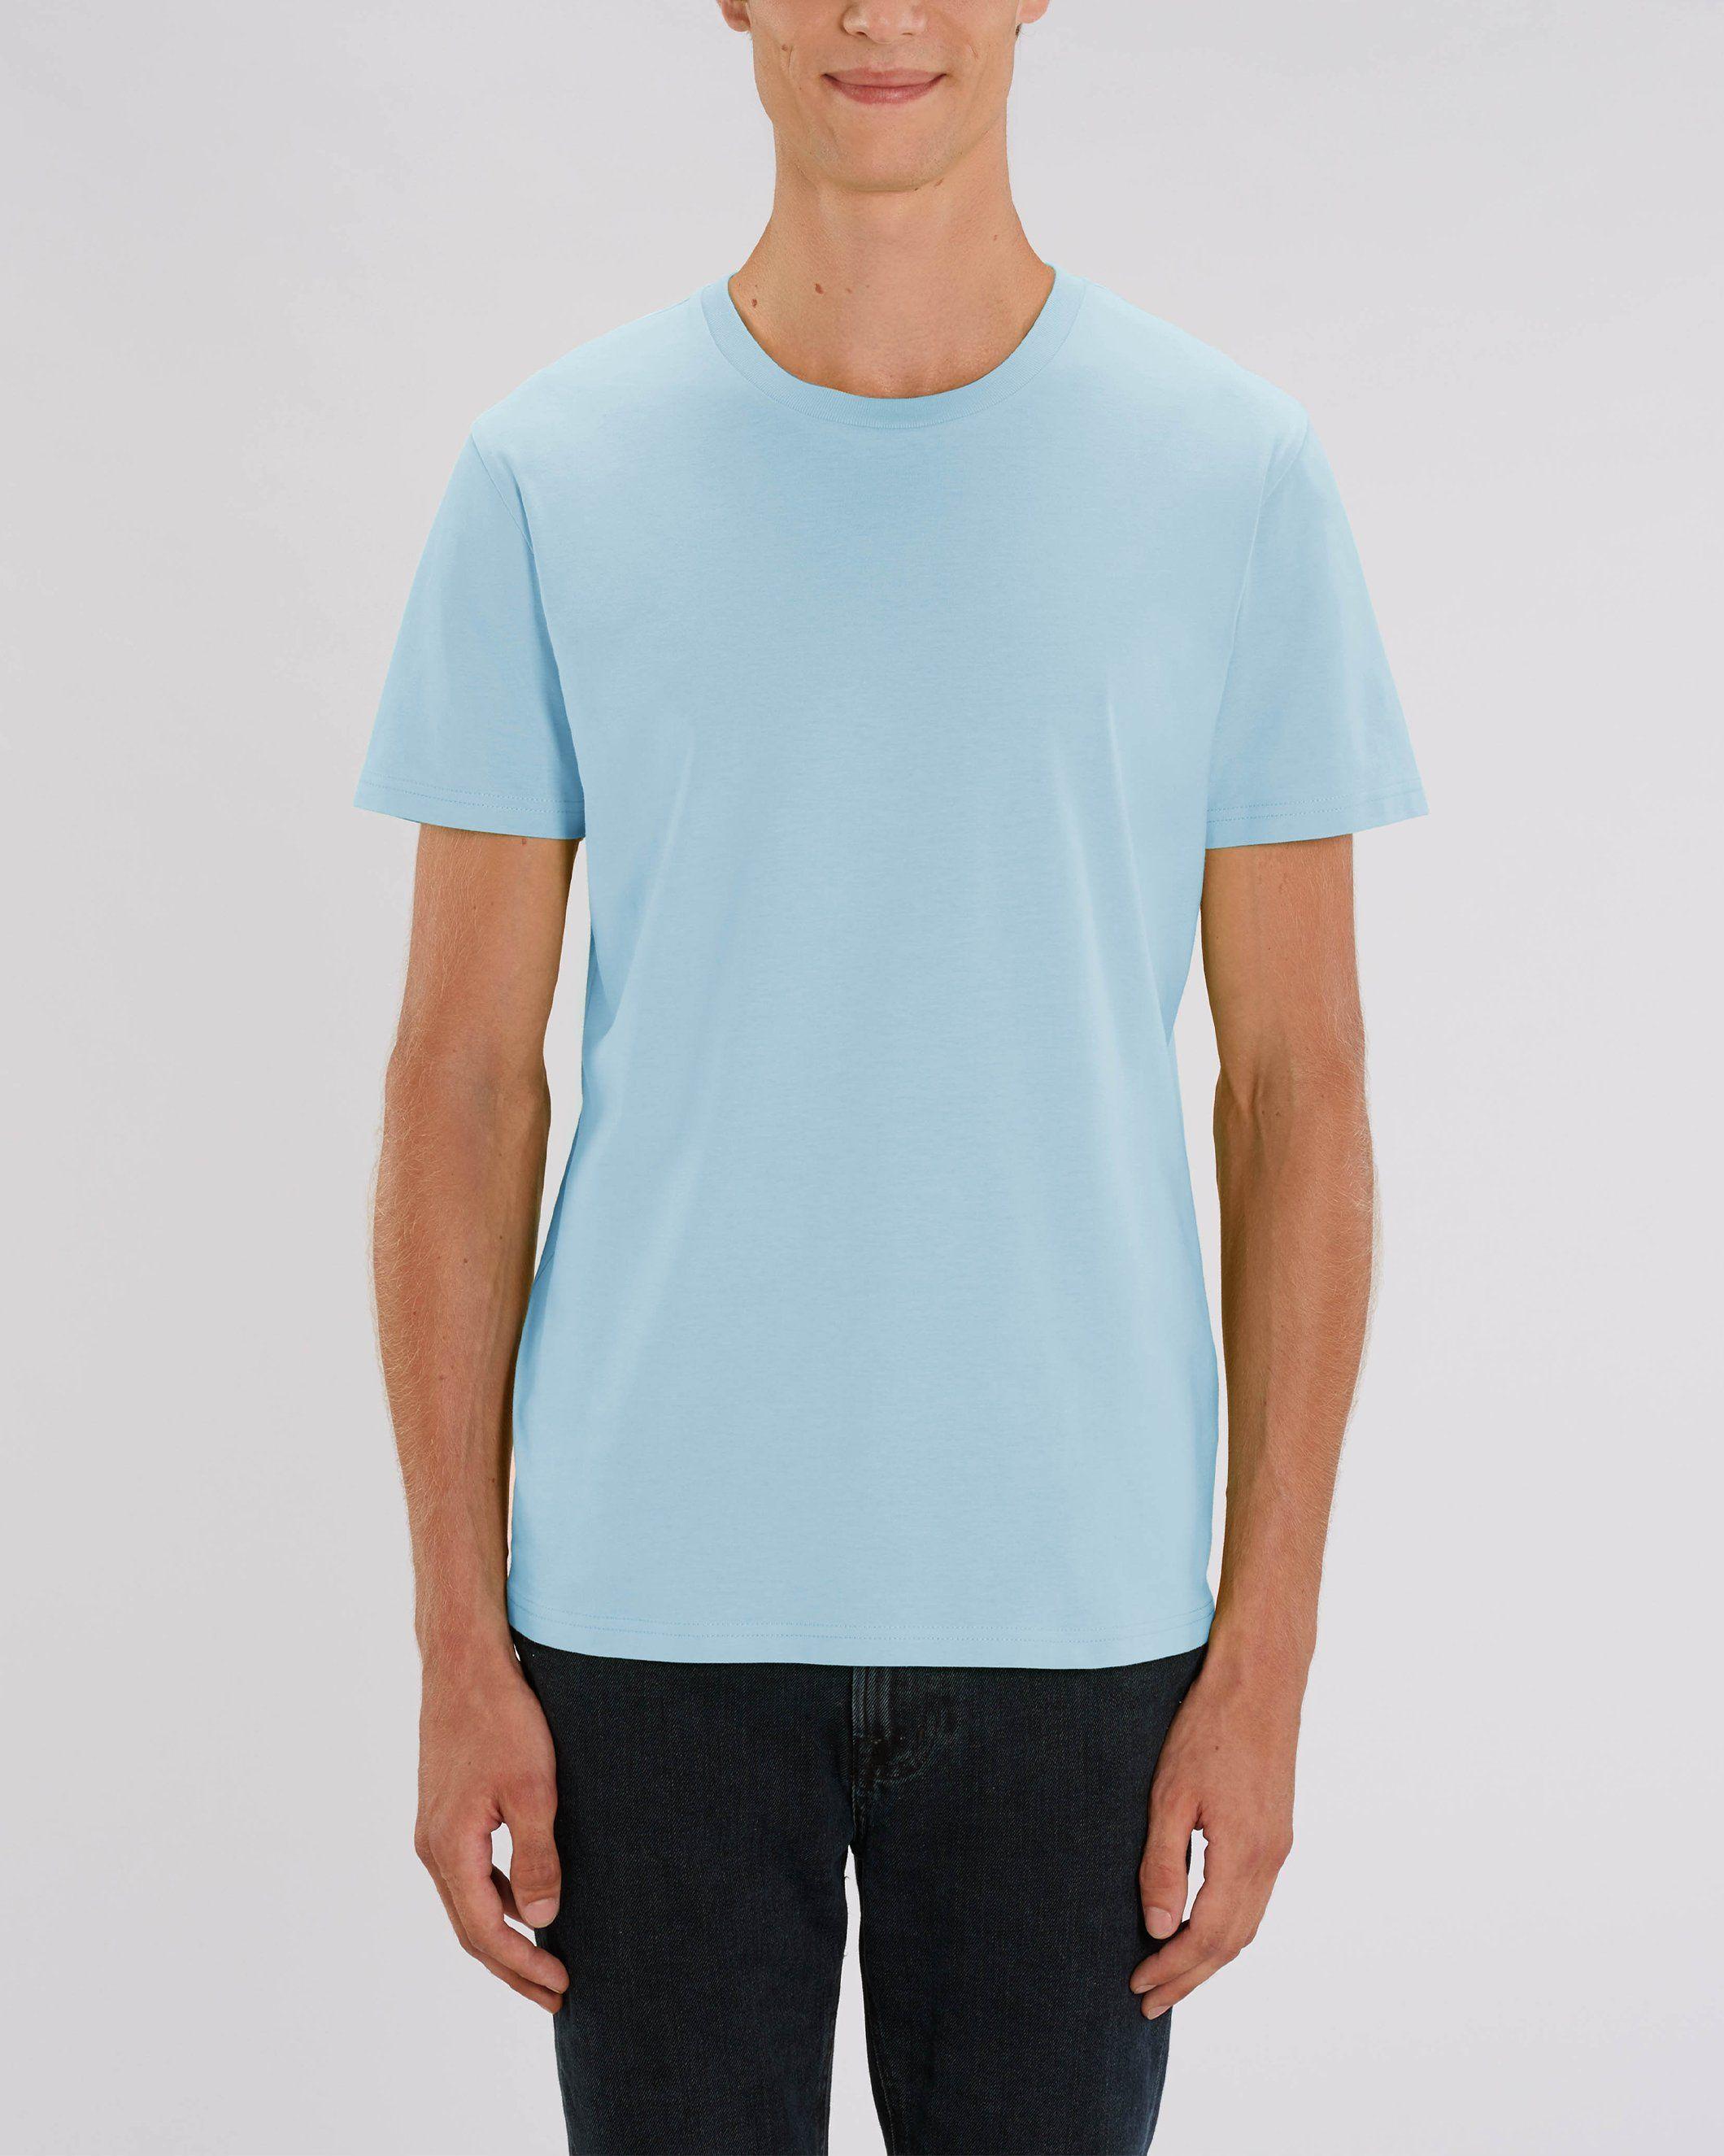 Nauli Unisex Regular Fit T-Shirt in Sky Blue